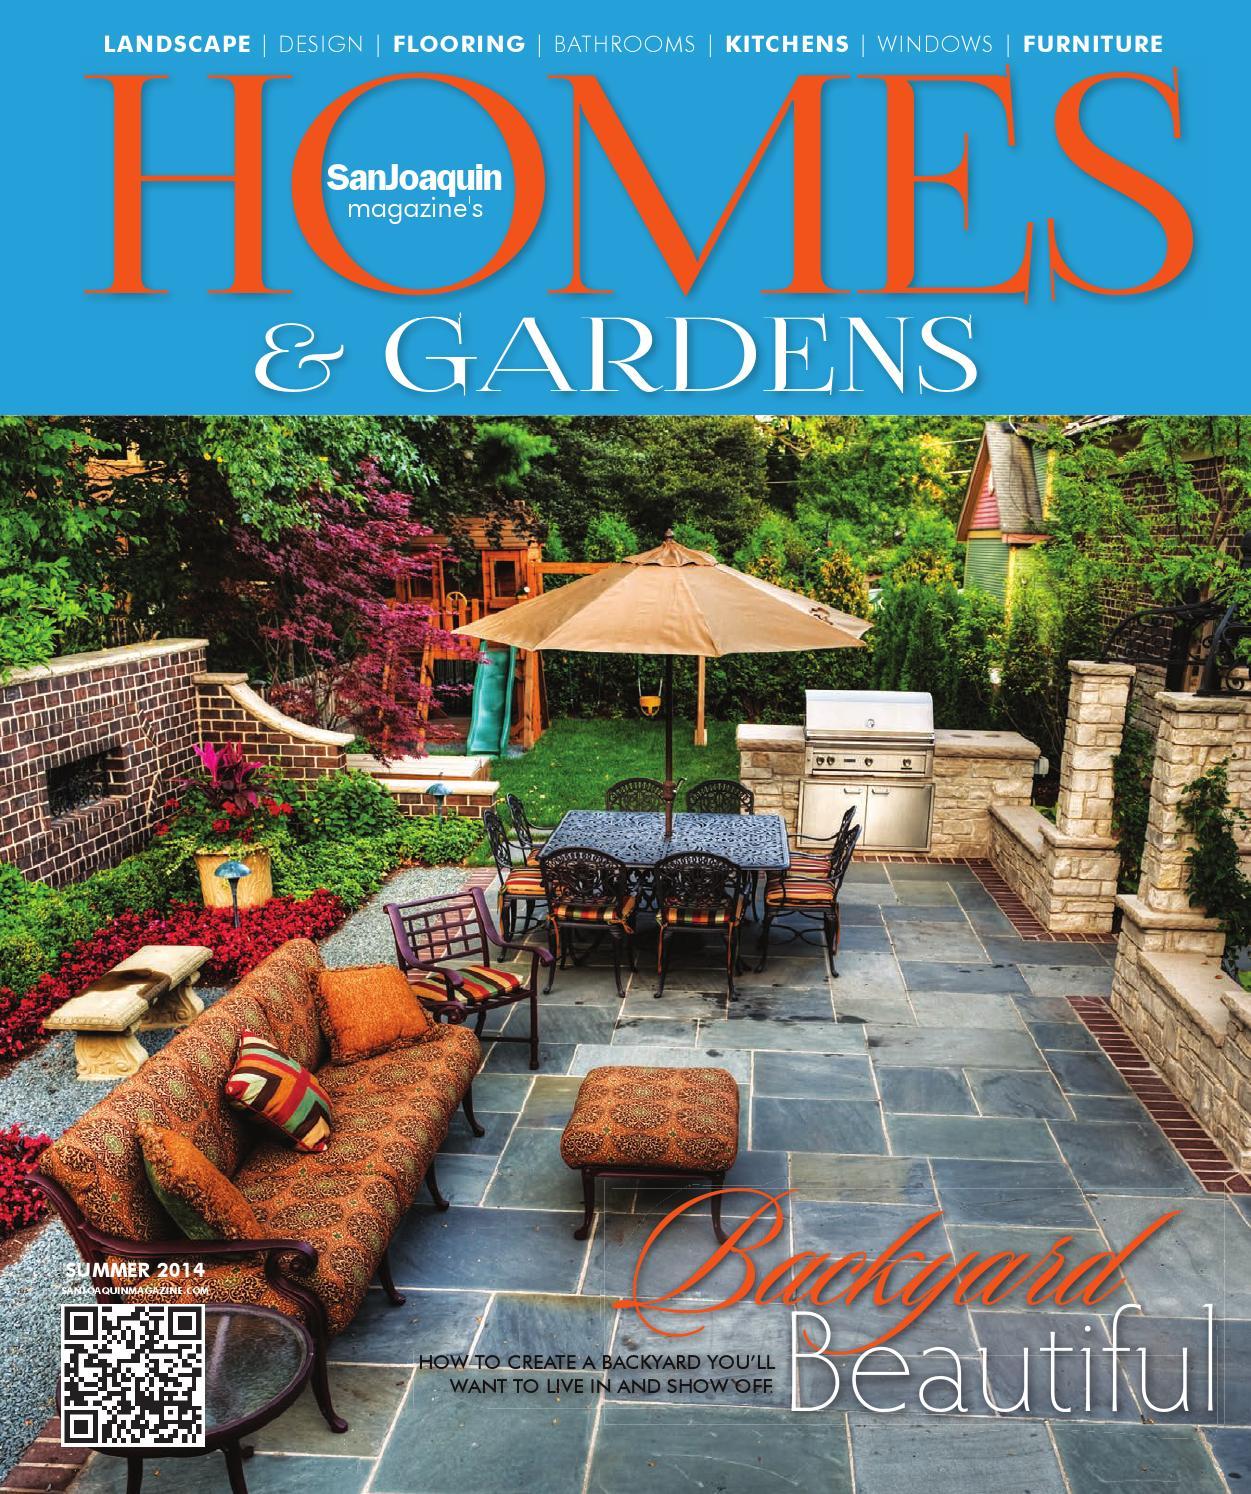 San Joaquin Homes Gardens By San Joaquin Magazine Issuu